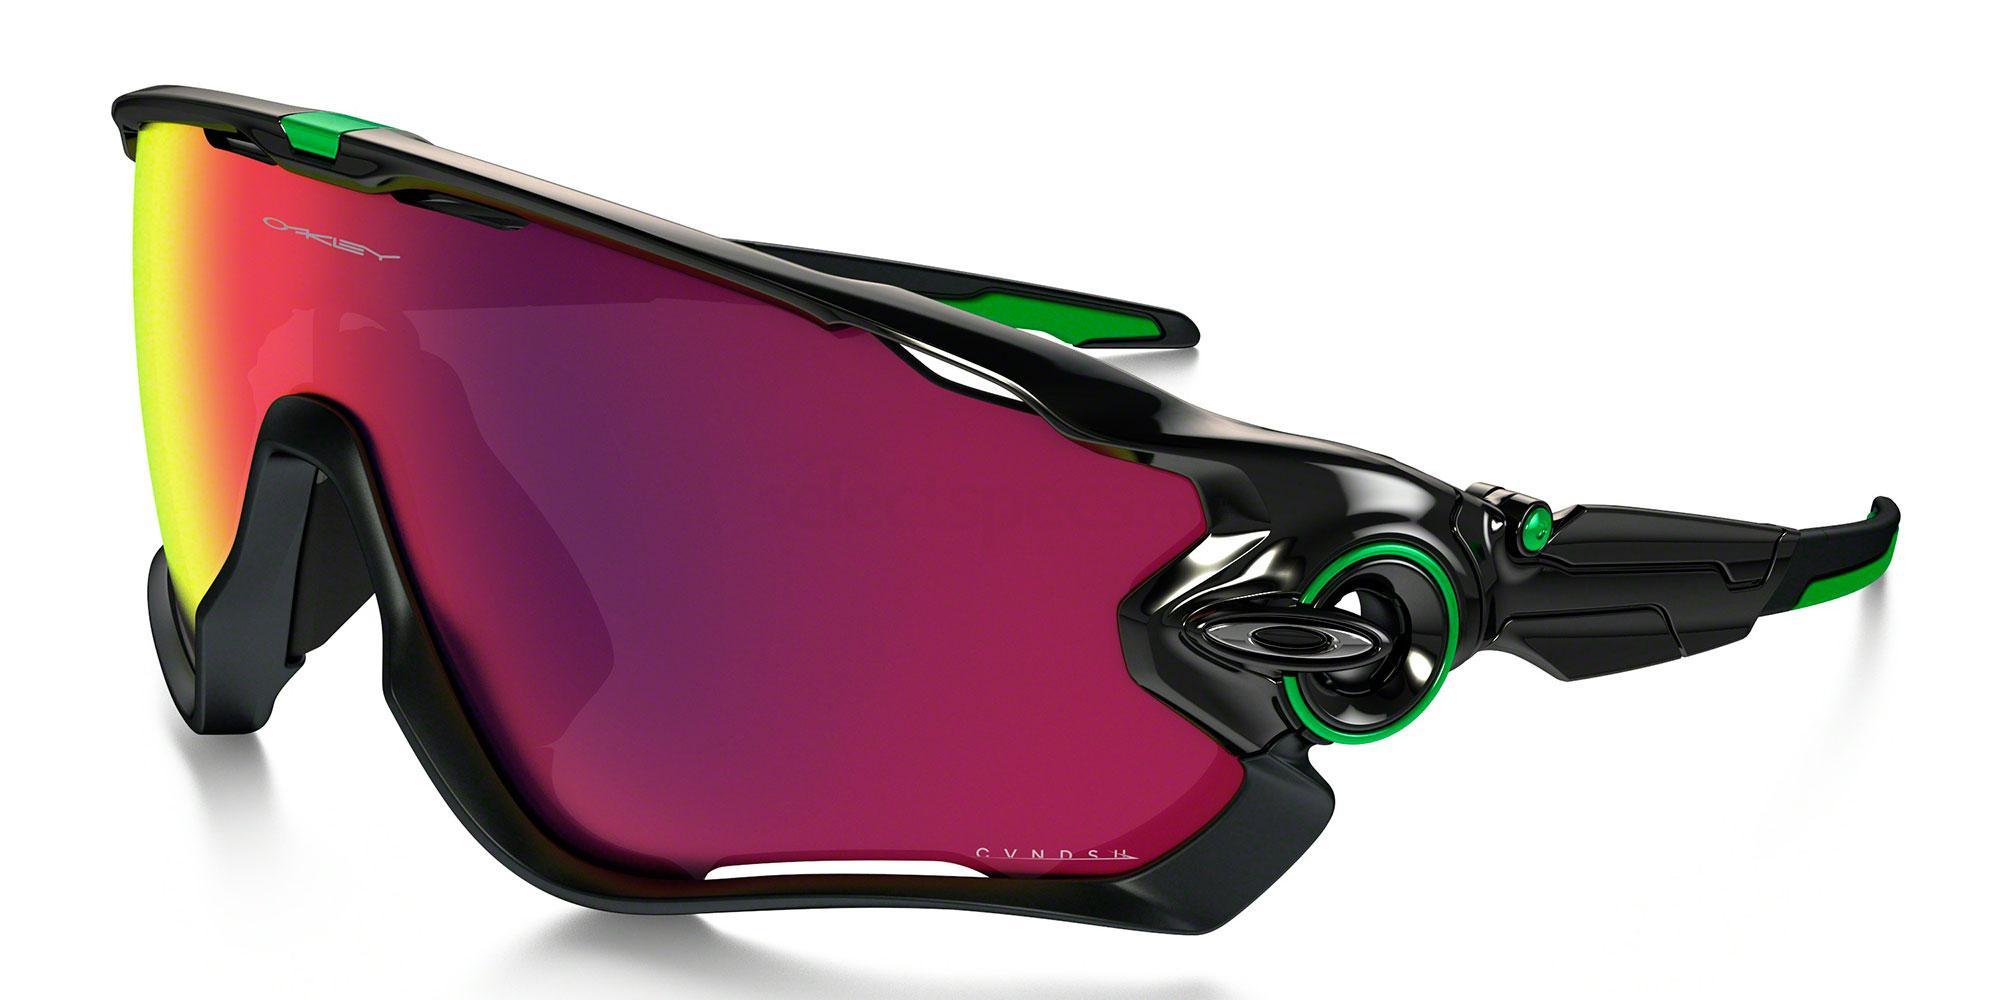 929010 OO9290 CAVENDISH PRIZM ROAD JAWBREAKER Sunglasses, Oakley